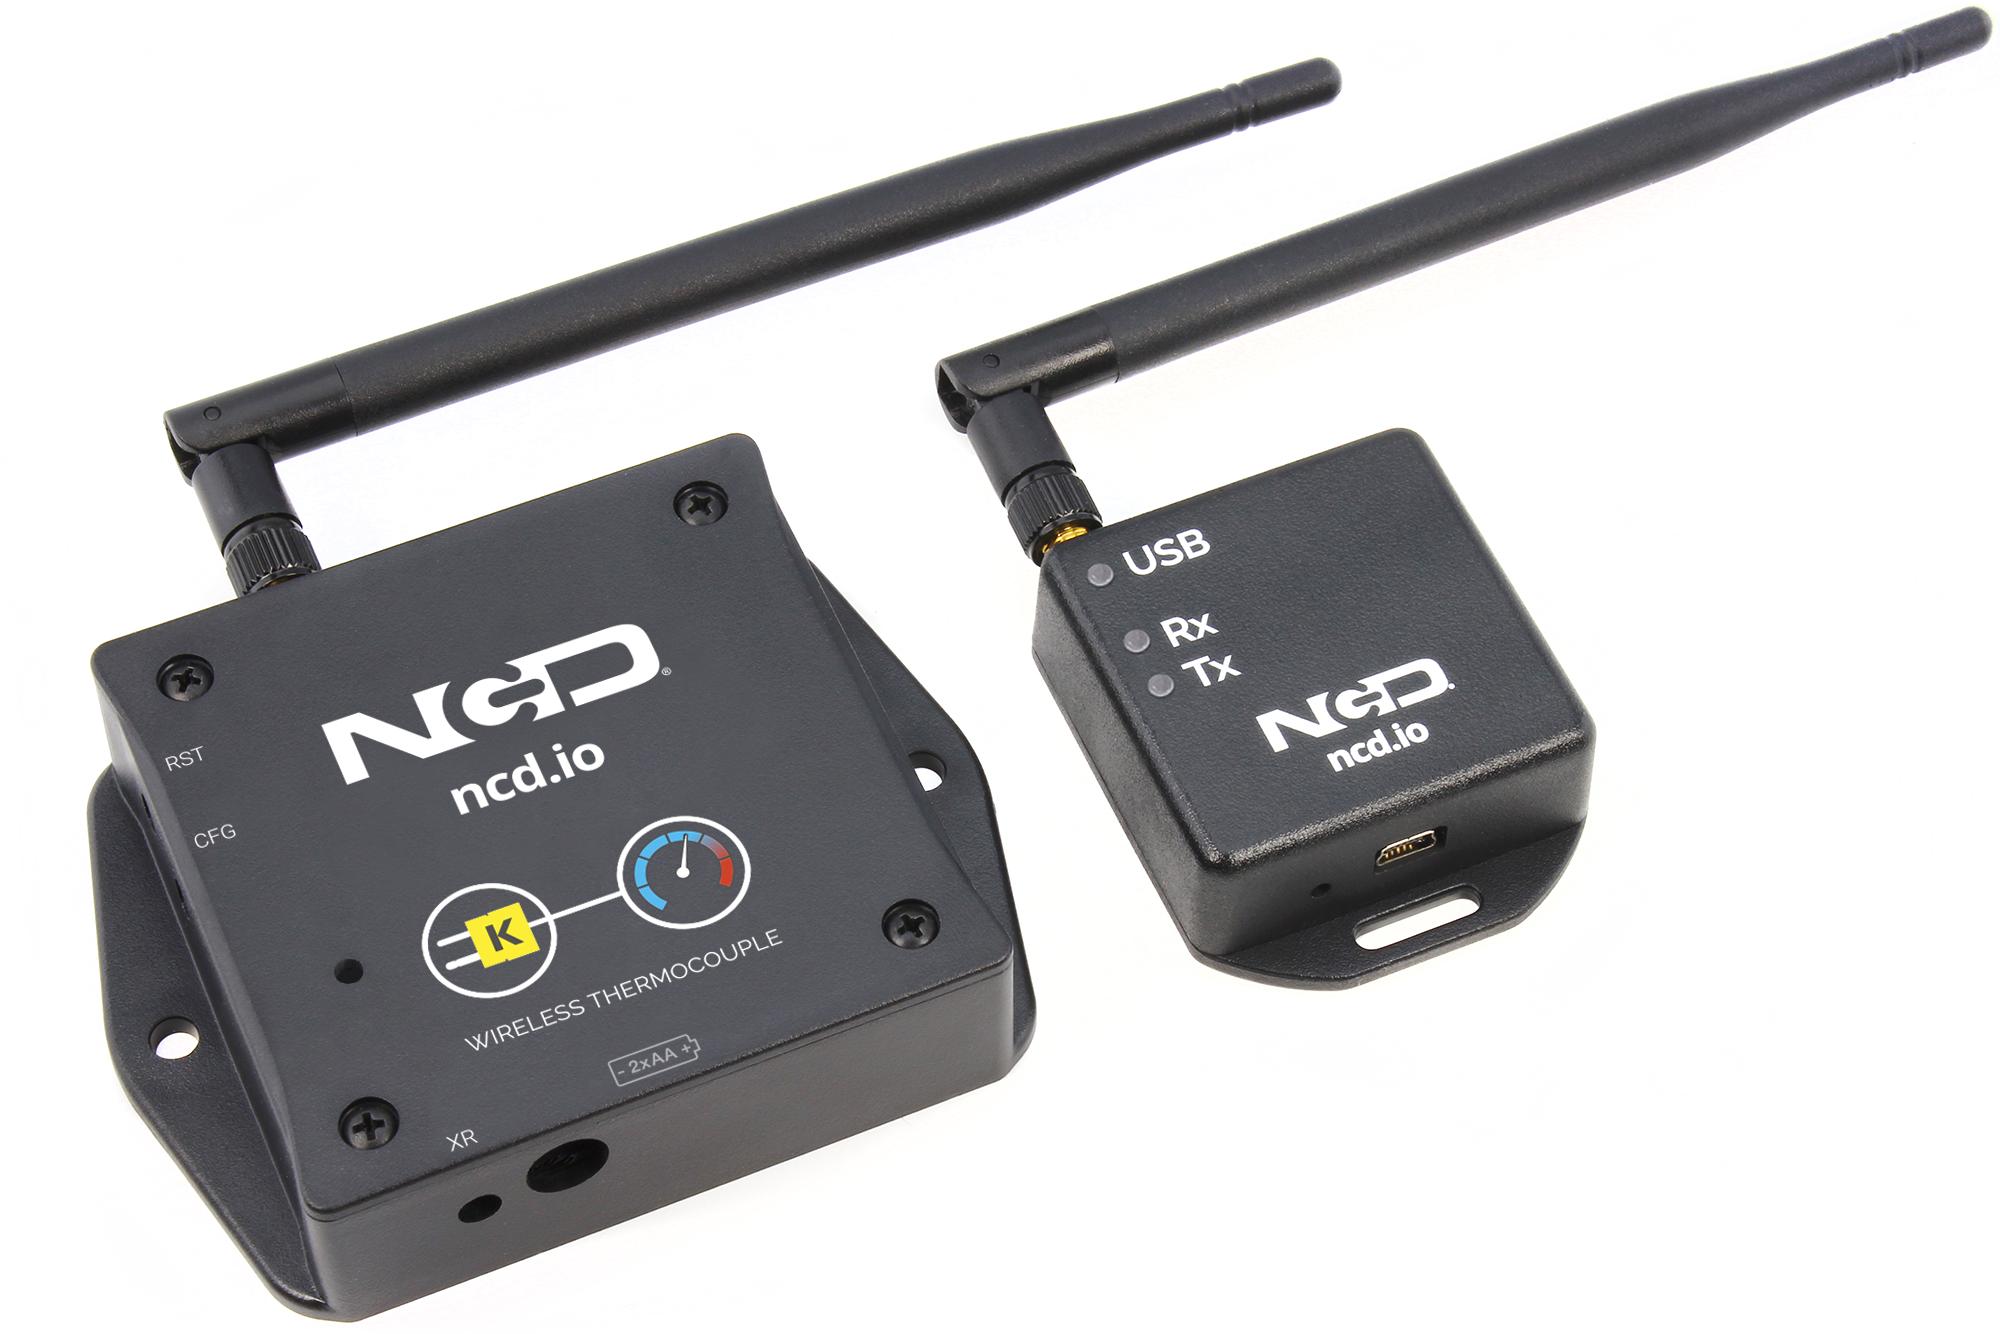 iot wireless thermocouple